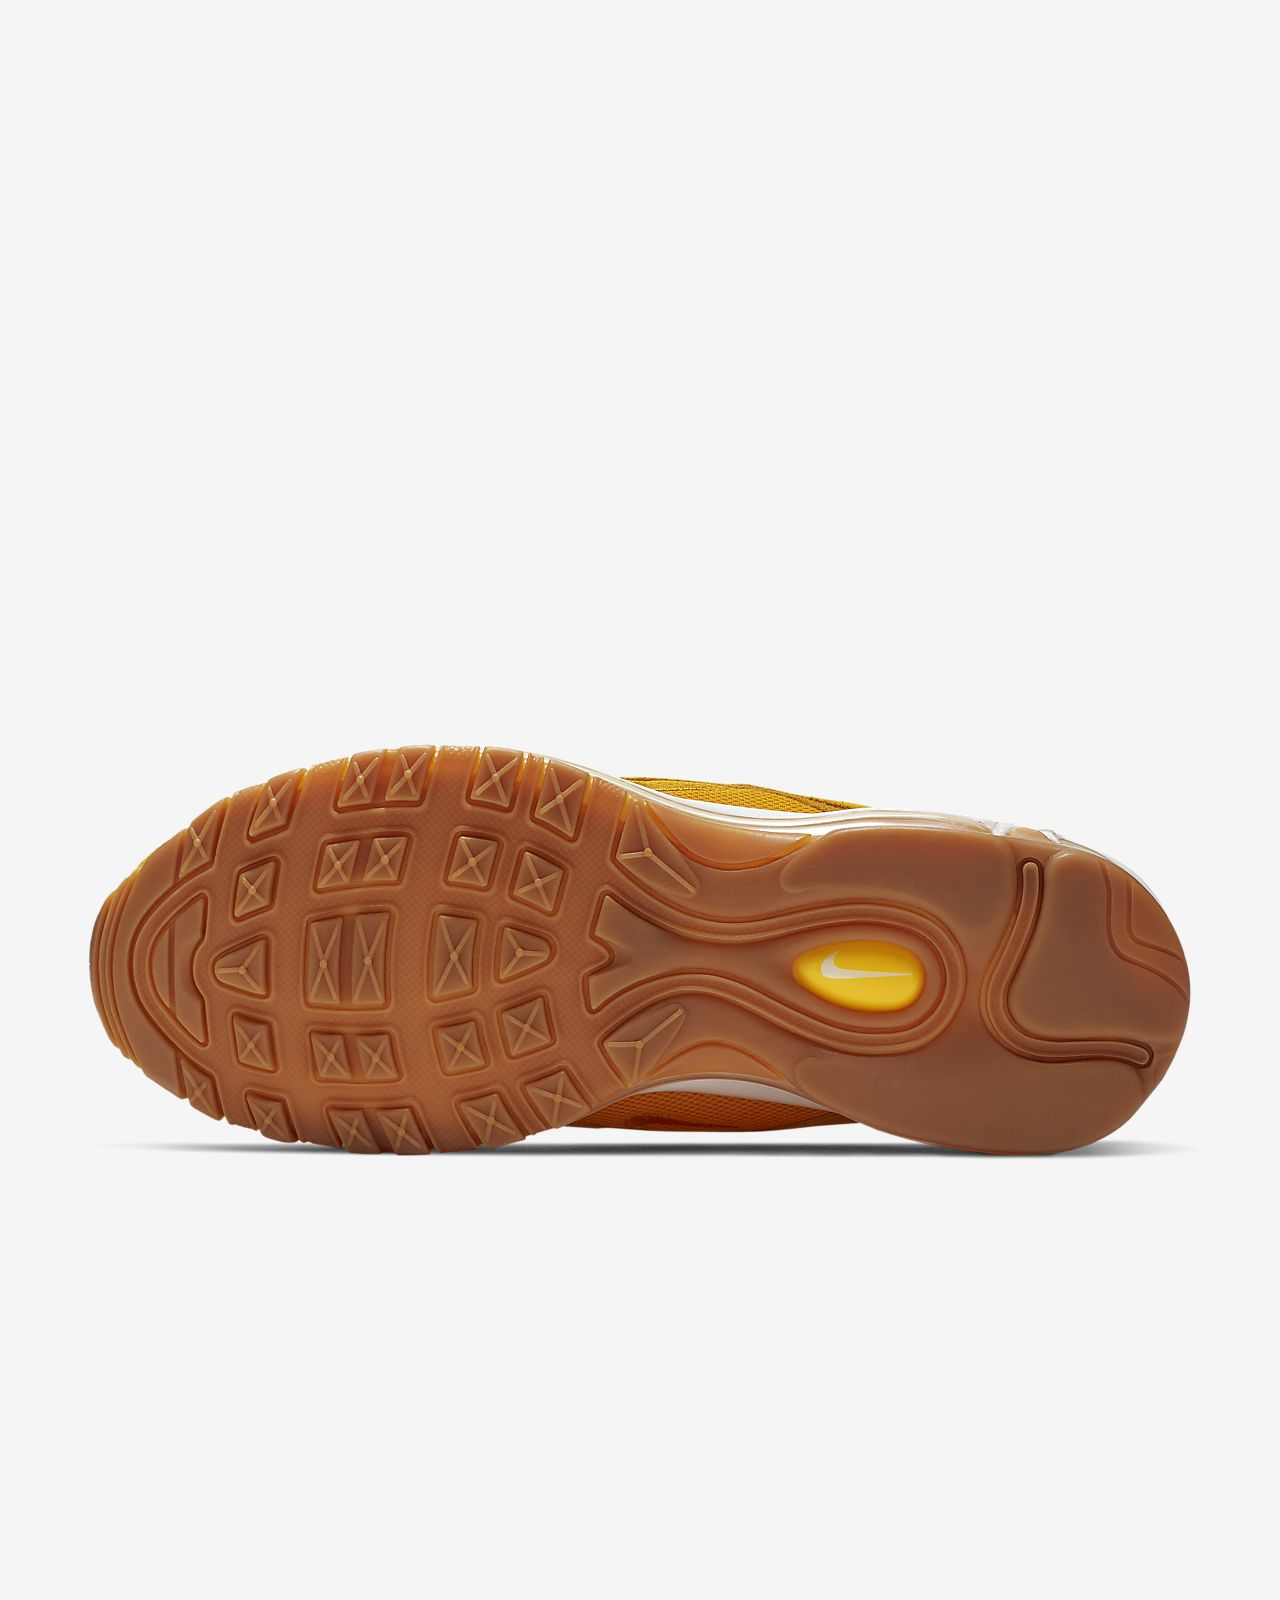 37c4f8266e Nike Air Max 97 Premium Women's Shoe. Nike.com